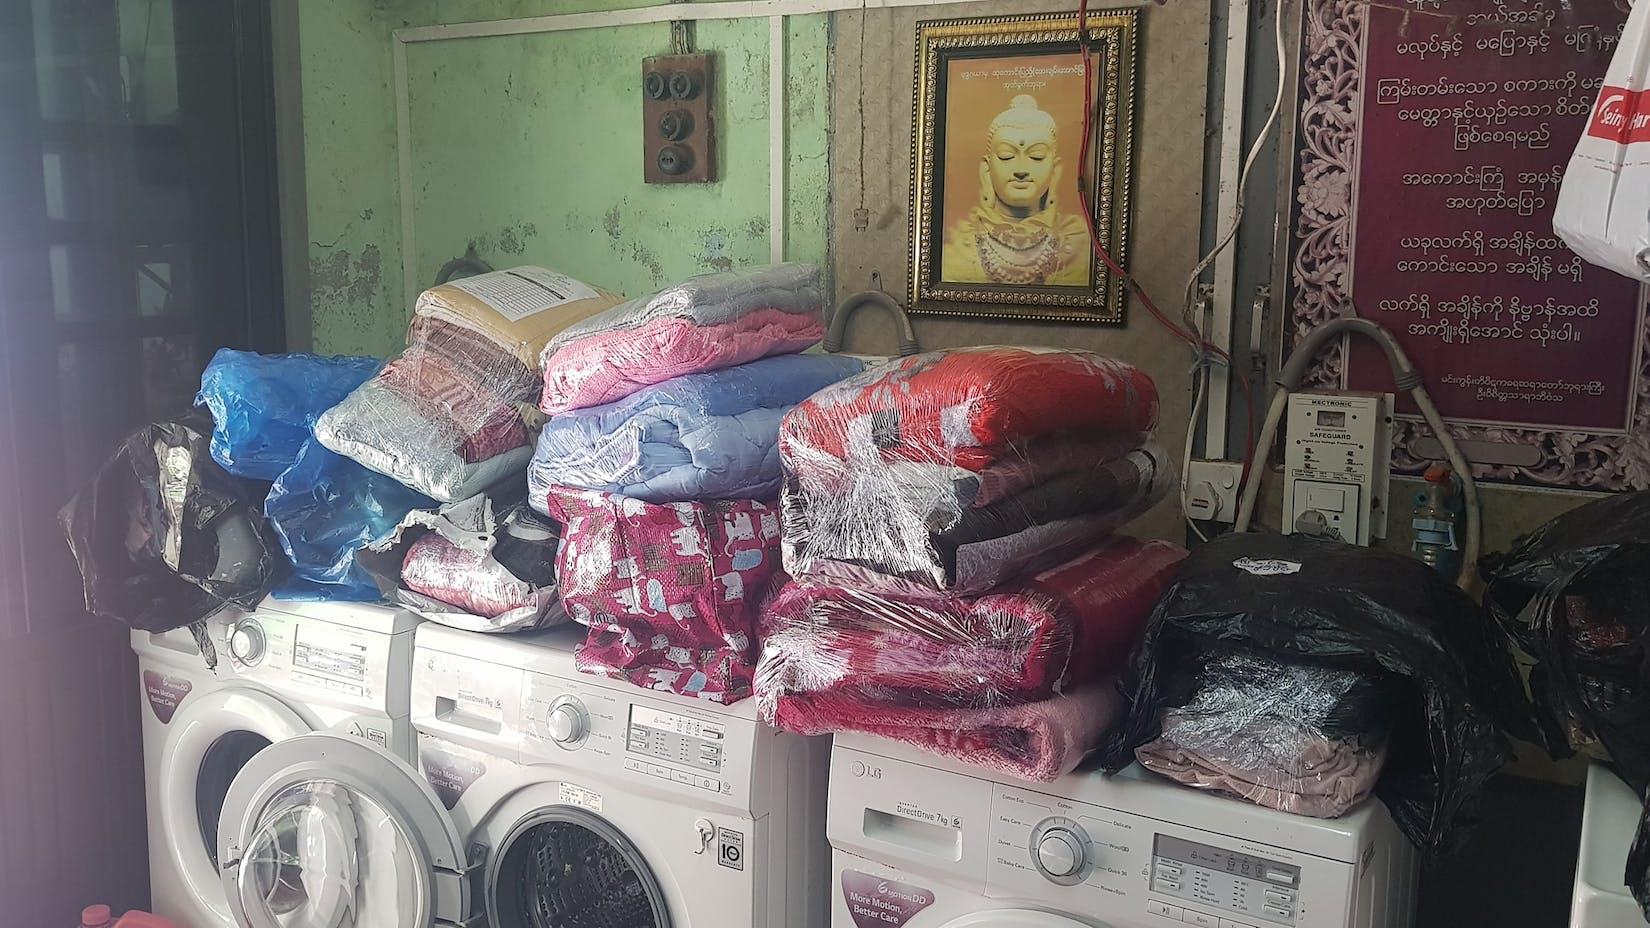 Magic Wash Professional Laundry | Beauty